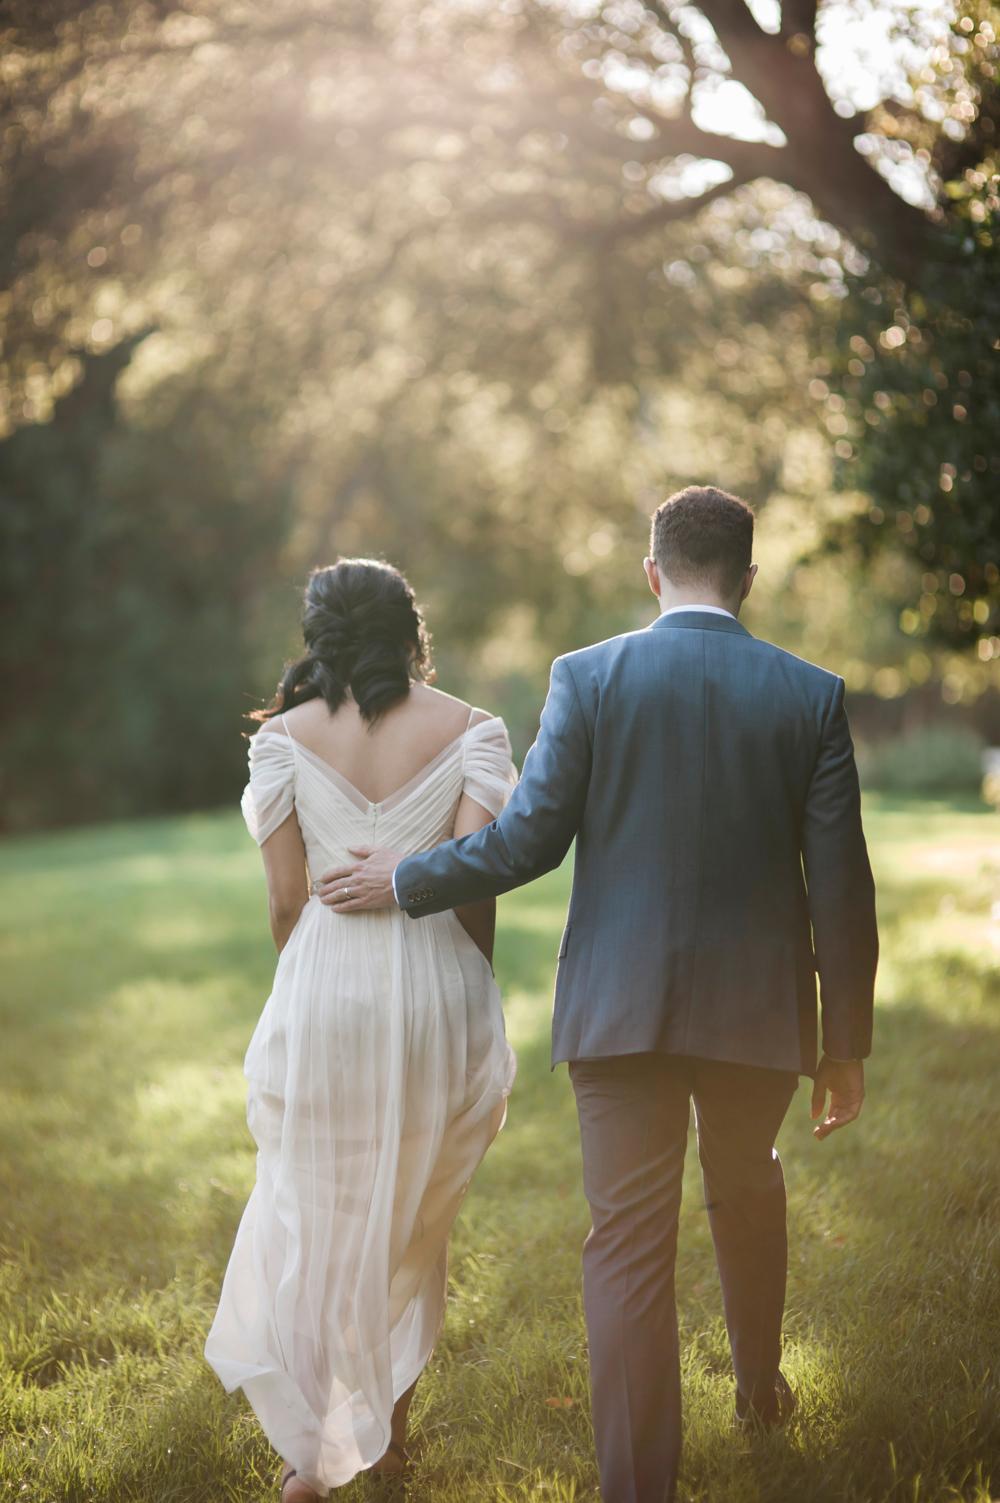 brazilian-room-fall-wedding-yeesheen-brian-lilouette-31.jpg